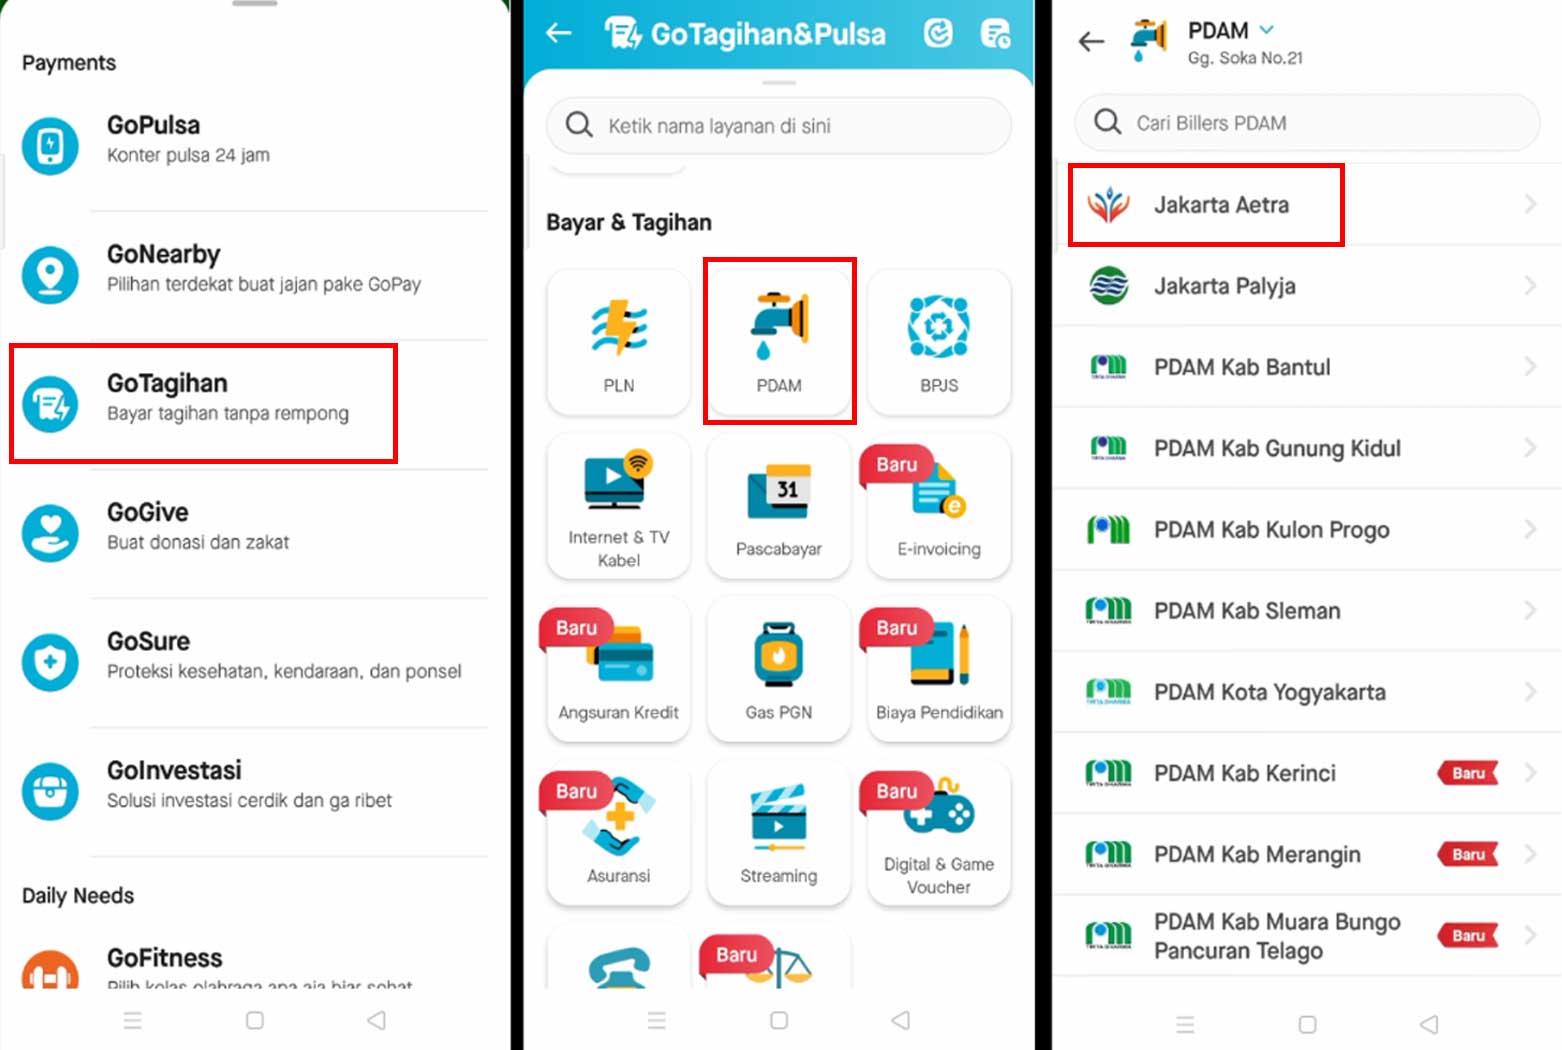 Cara Bayar PDAM Aetra Jakarta Pada Aplikasi Gojek Dengan GoPayLater